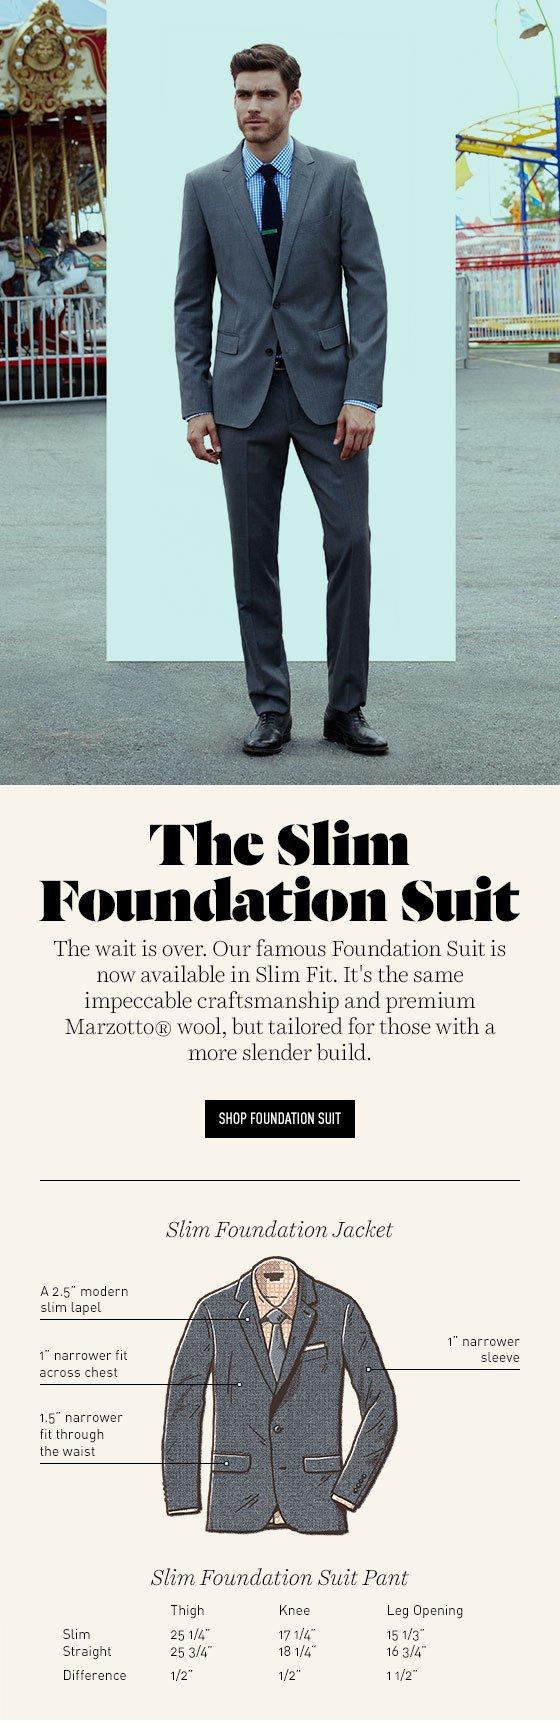 Introducing Slim Suits